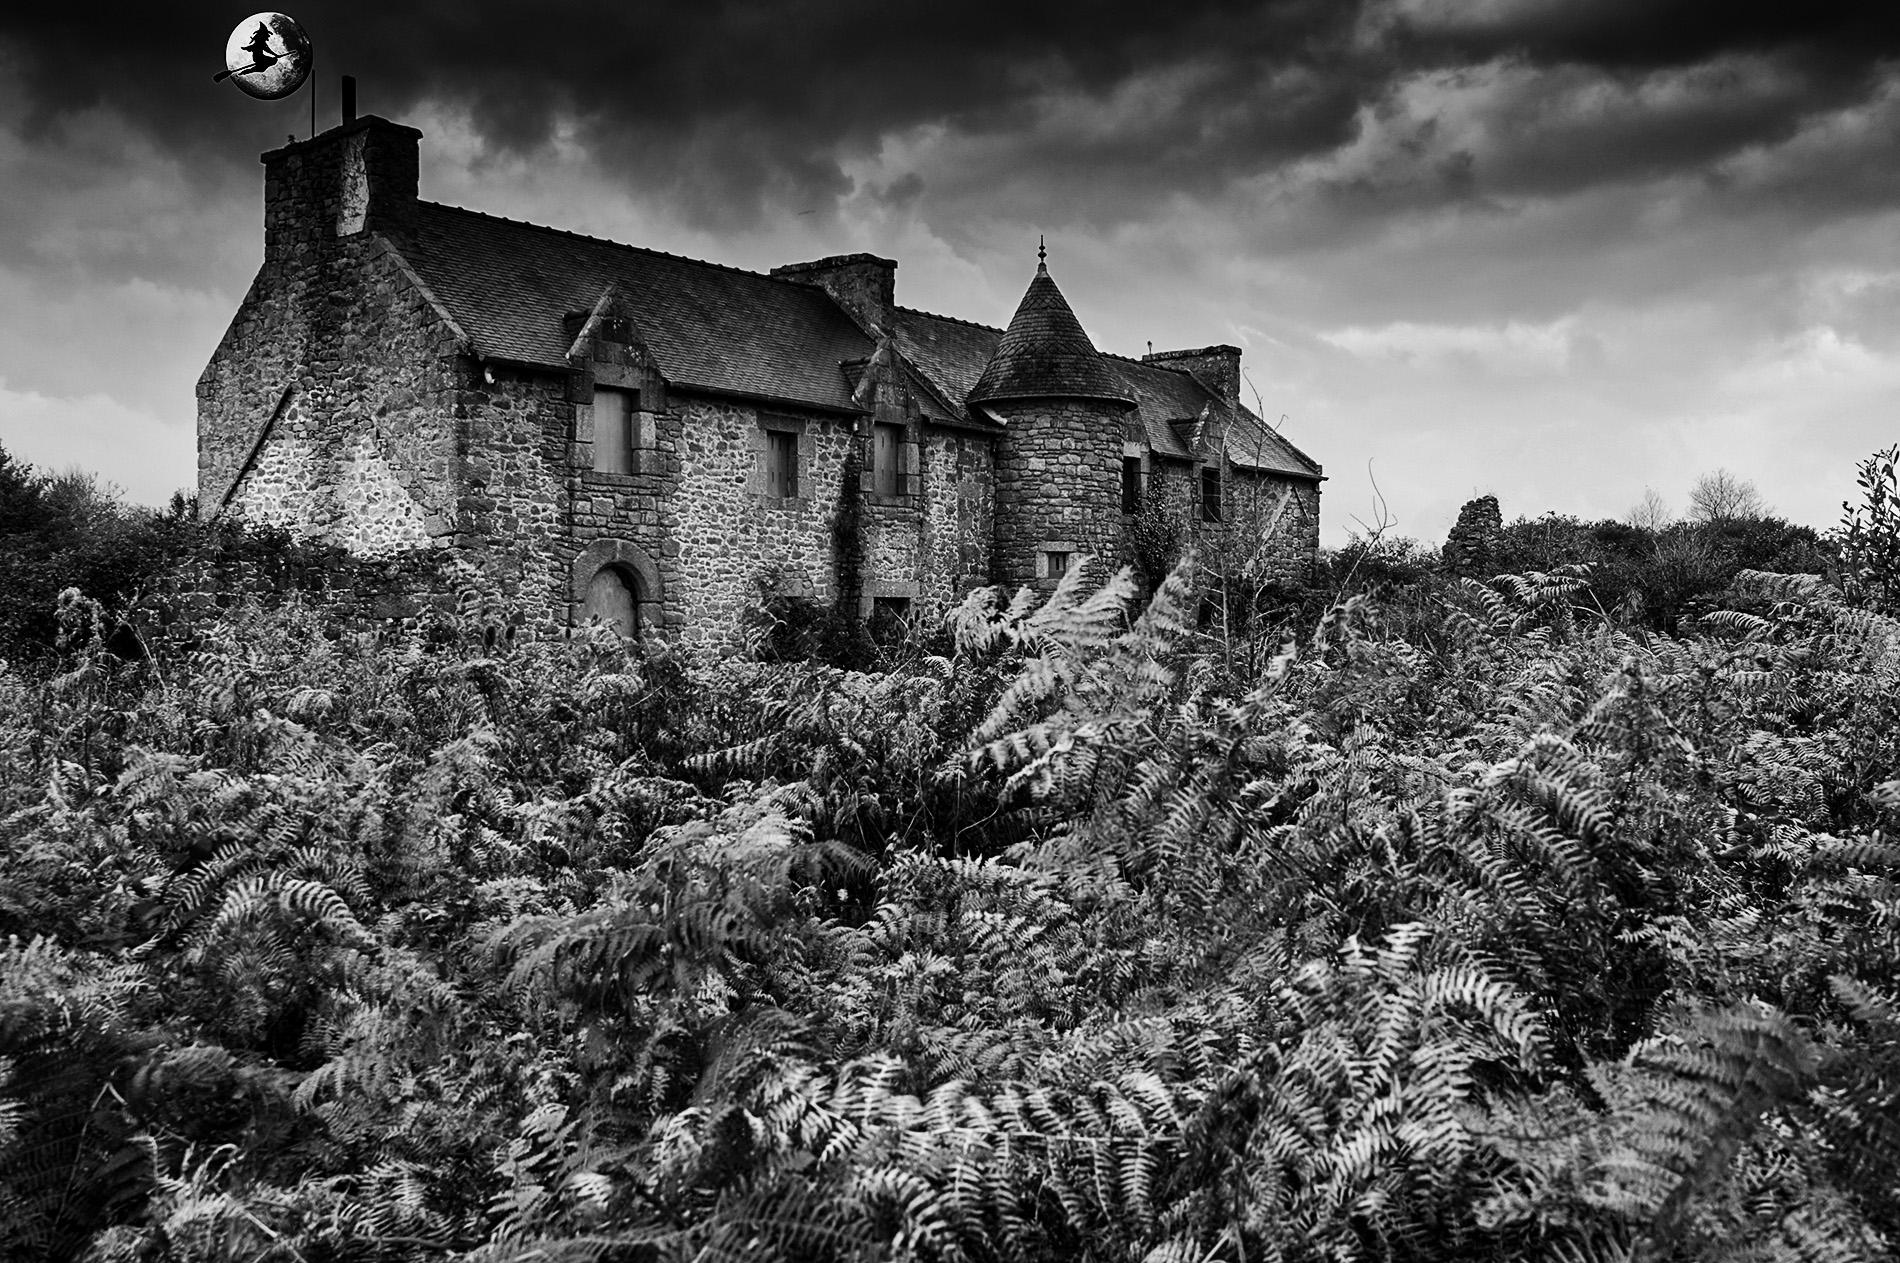 manoir abandonné, Halloween, urbex, noir et blanc,